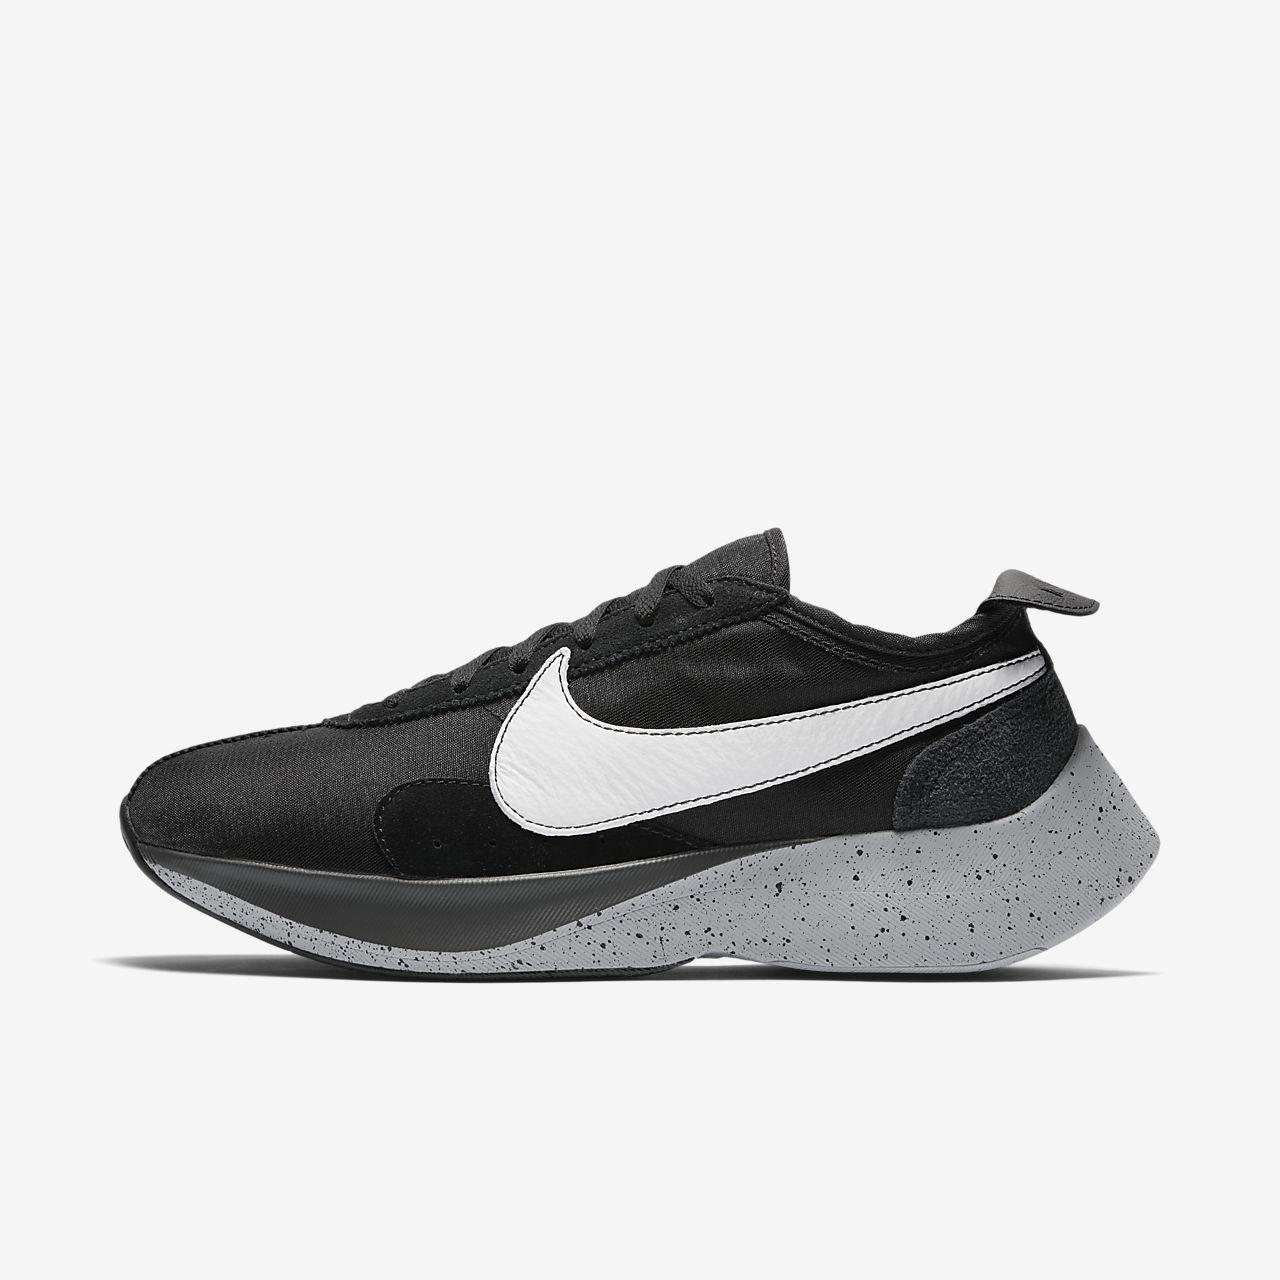 wholesale dealer 66659 5b60b Nike Moon Racer Men s Shoe. Nike.com